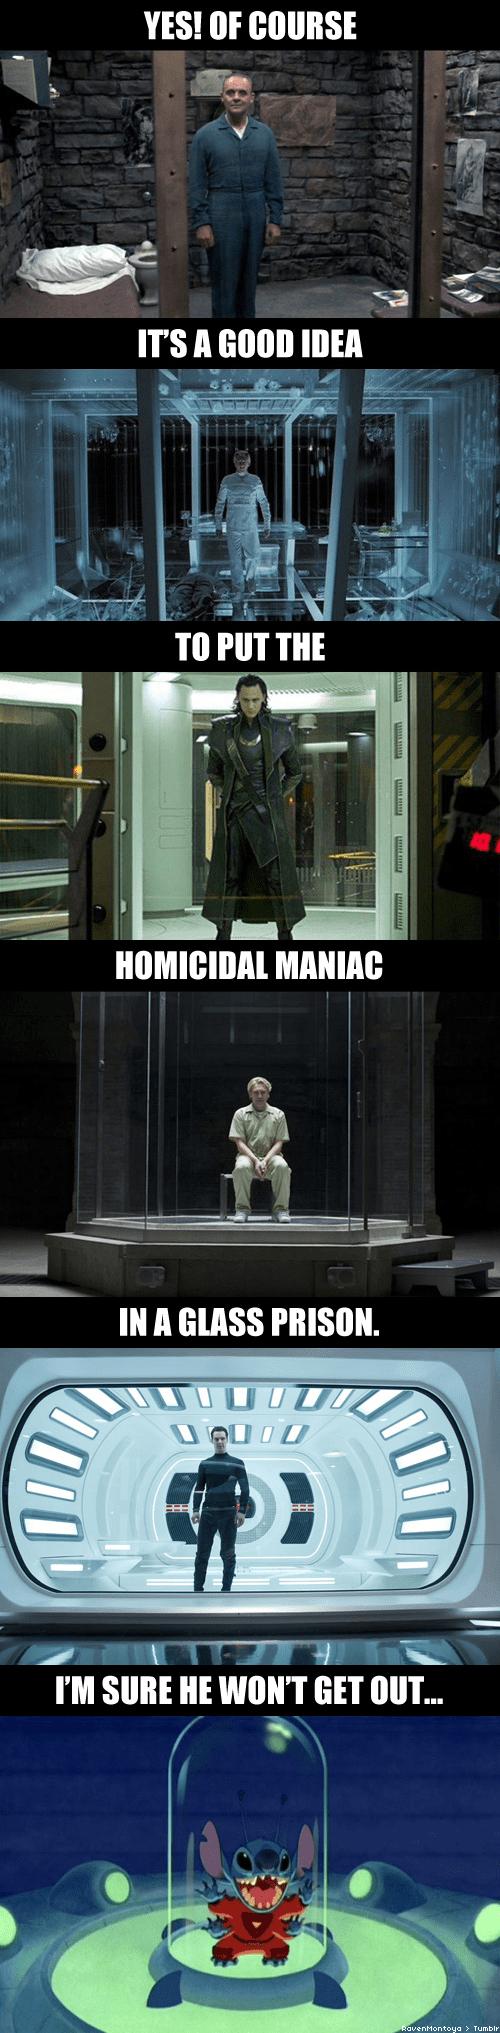 movies villains glass prisons - 7074839296